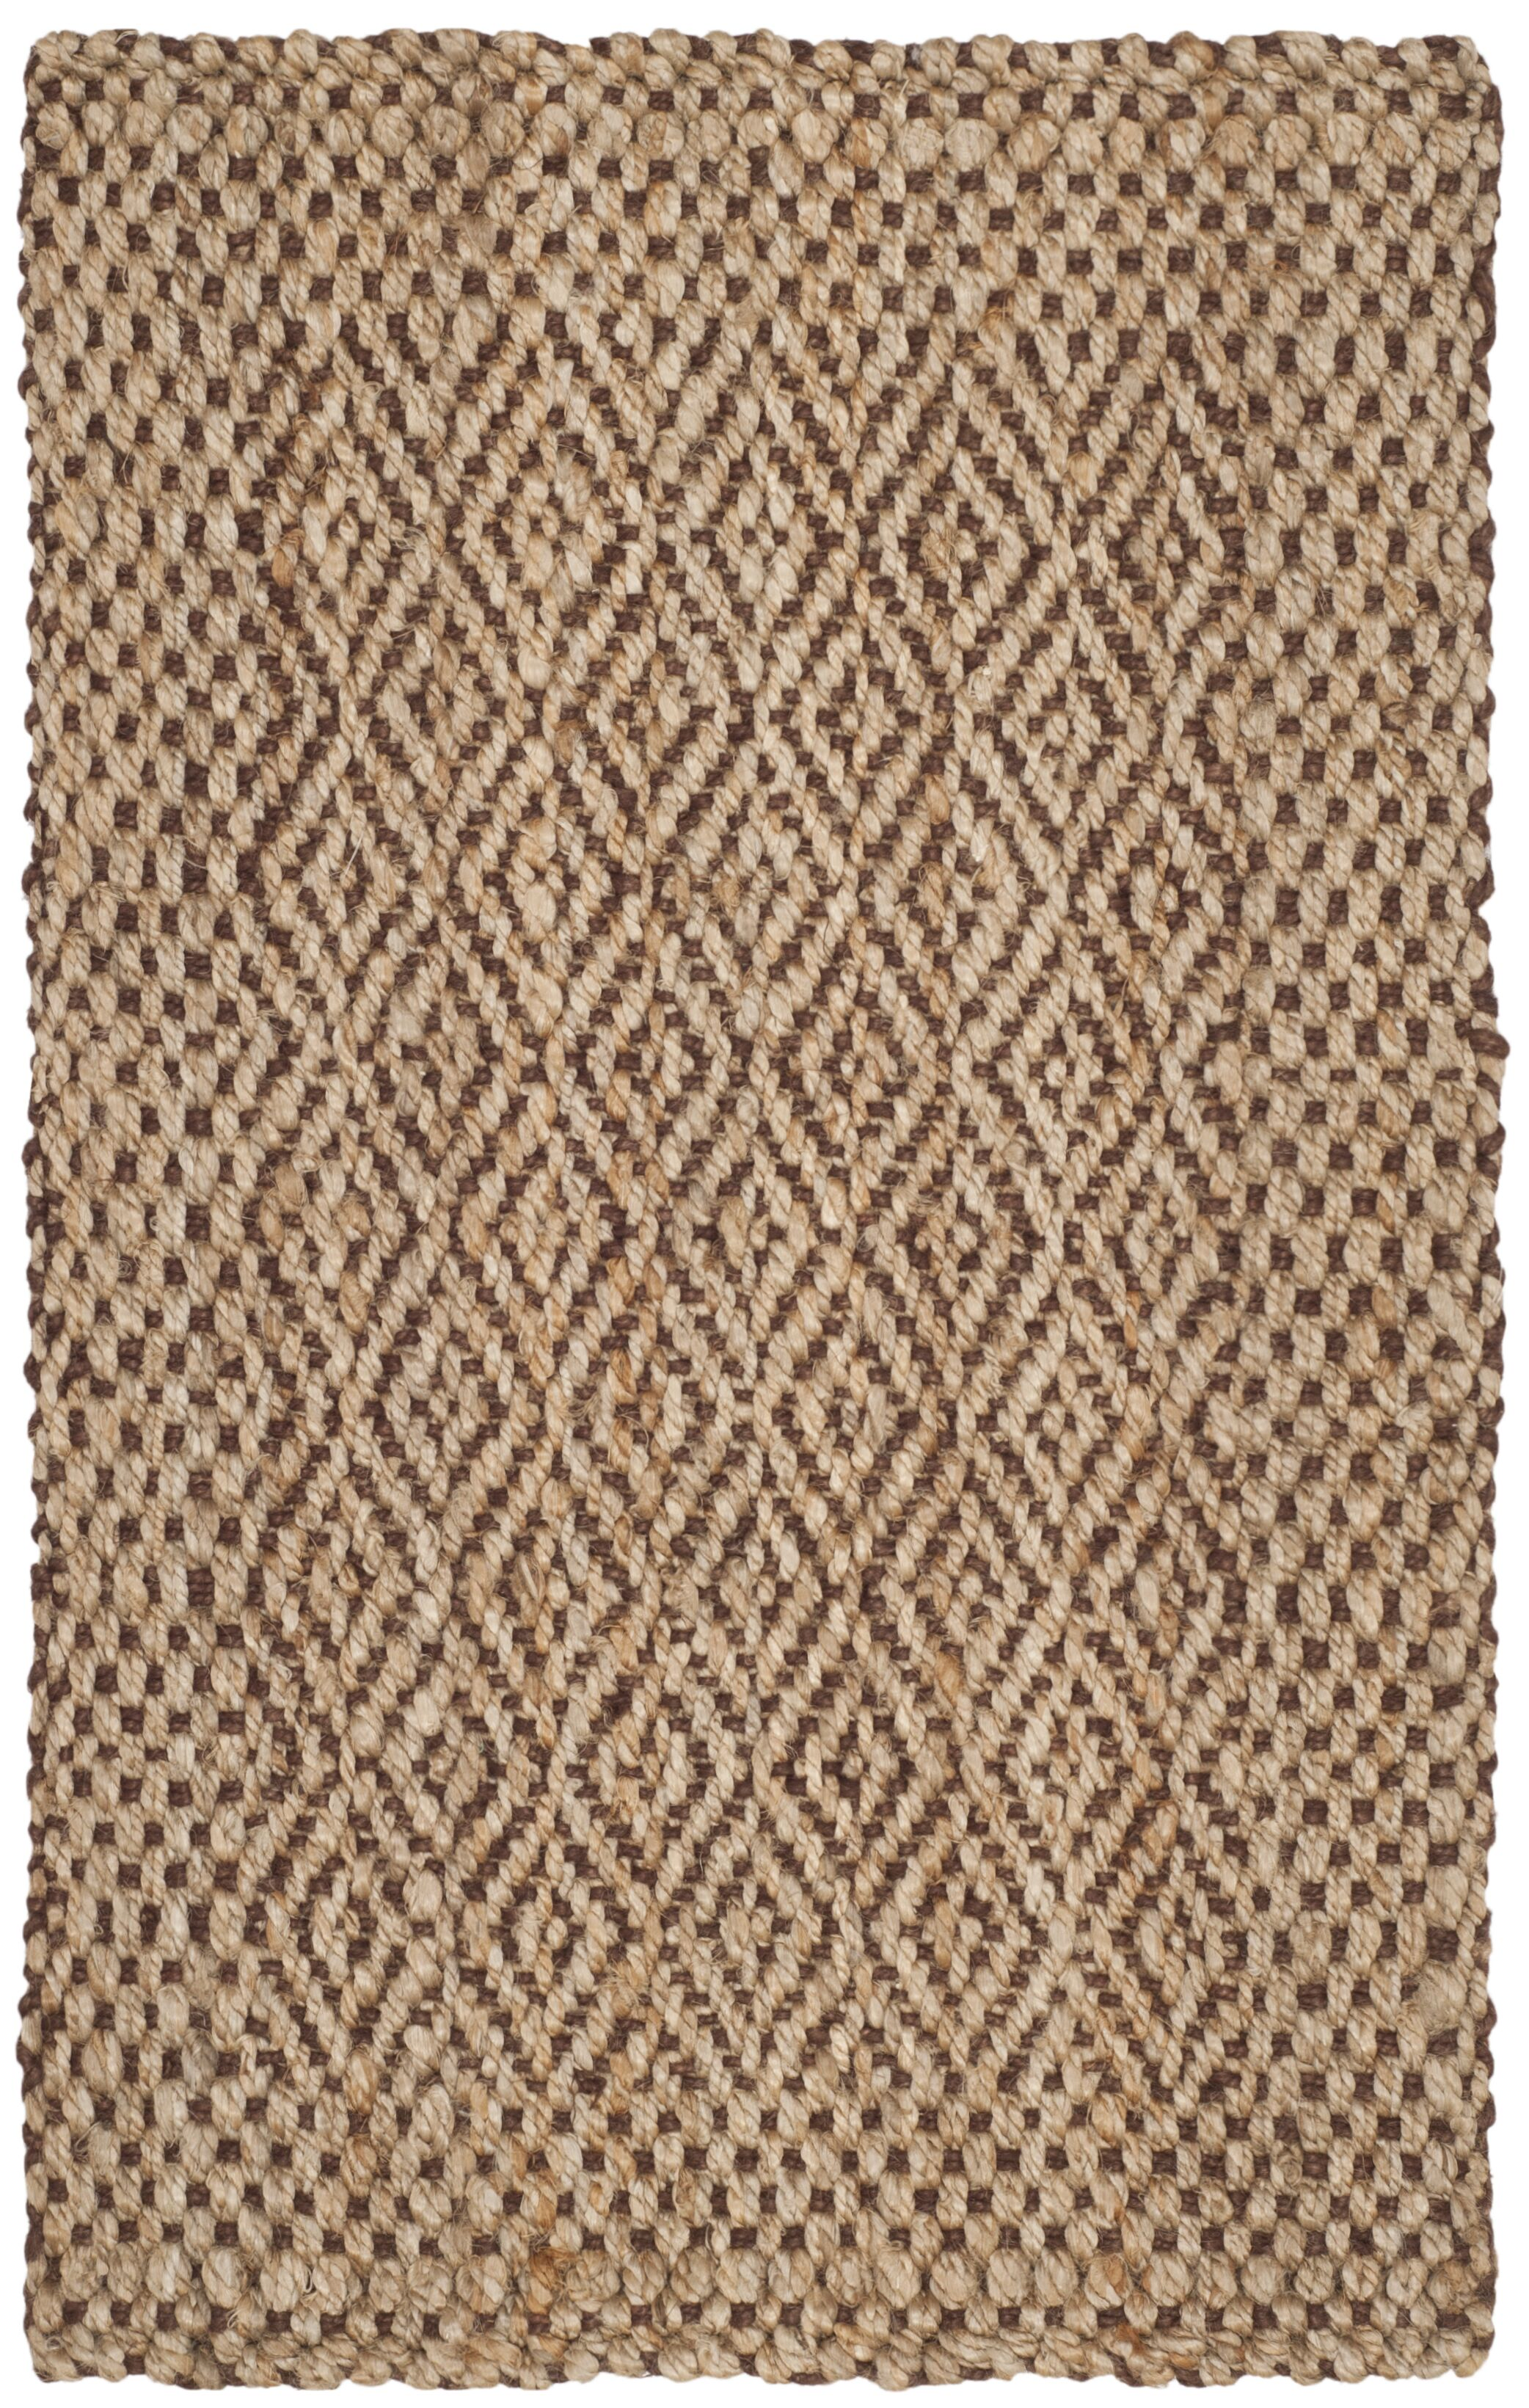 Lylee Fiber Hand-Woven Natural/Brown Area Rug Rug Size: Runner 2'3